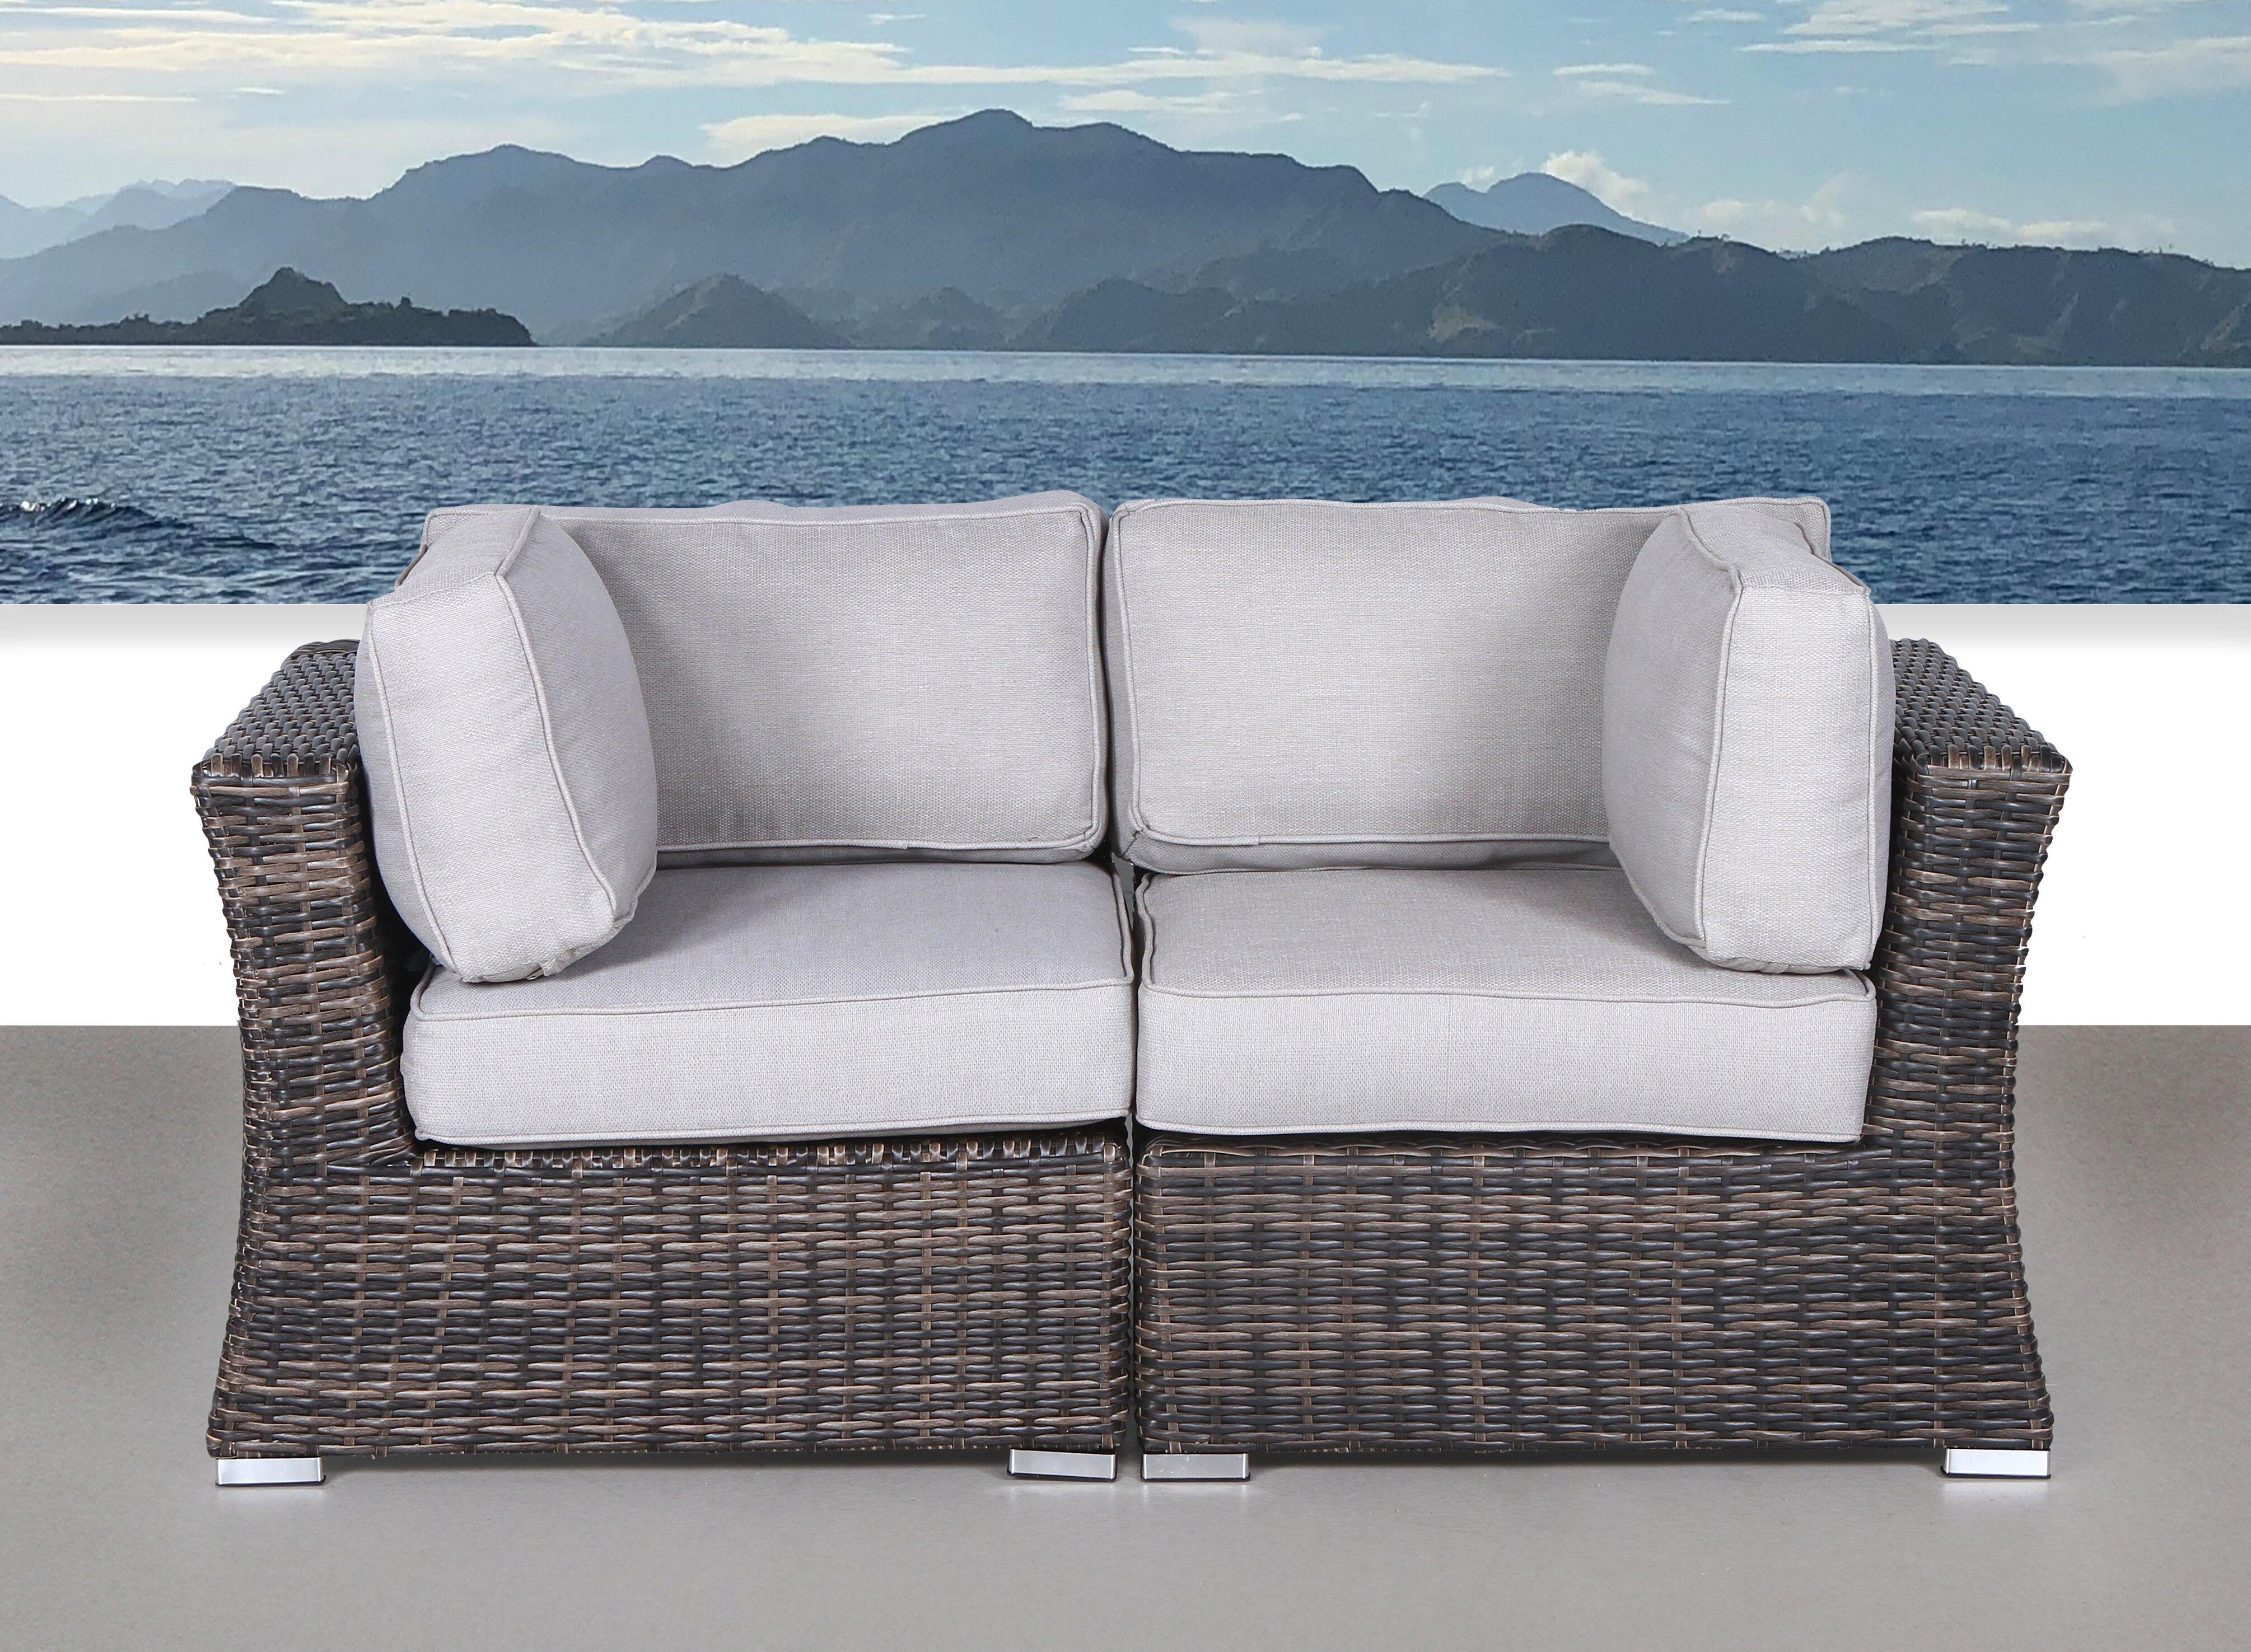 cushion cushions swatches view loveseat woodard patio crescent belden aluminum zm